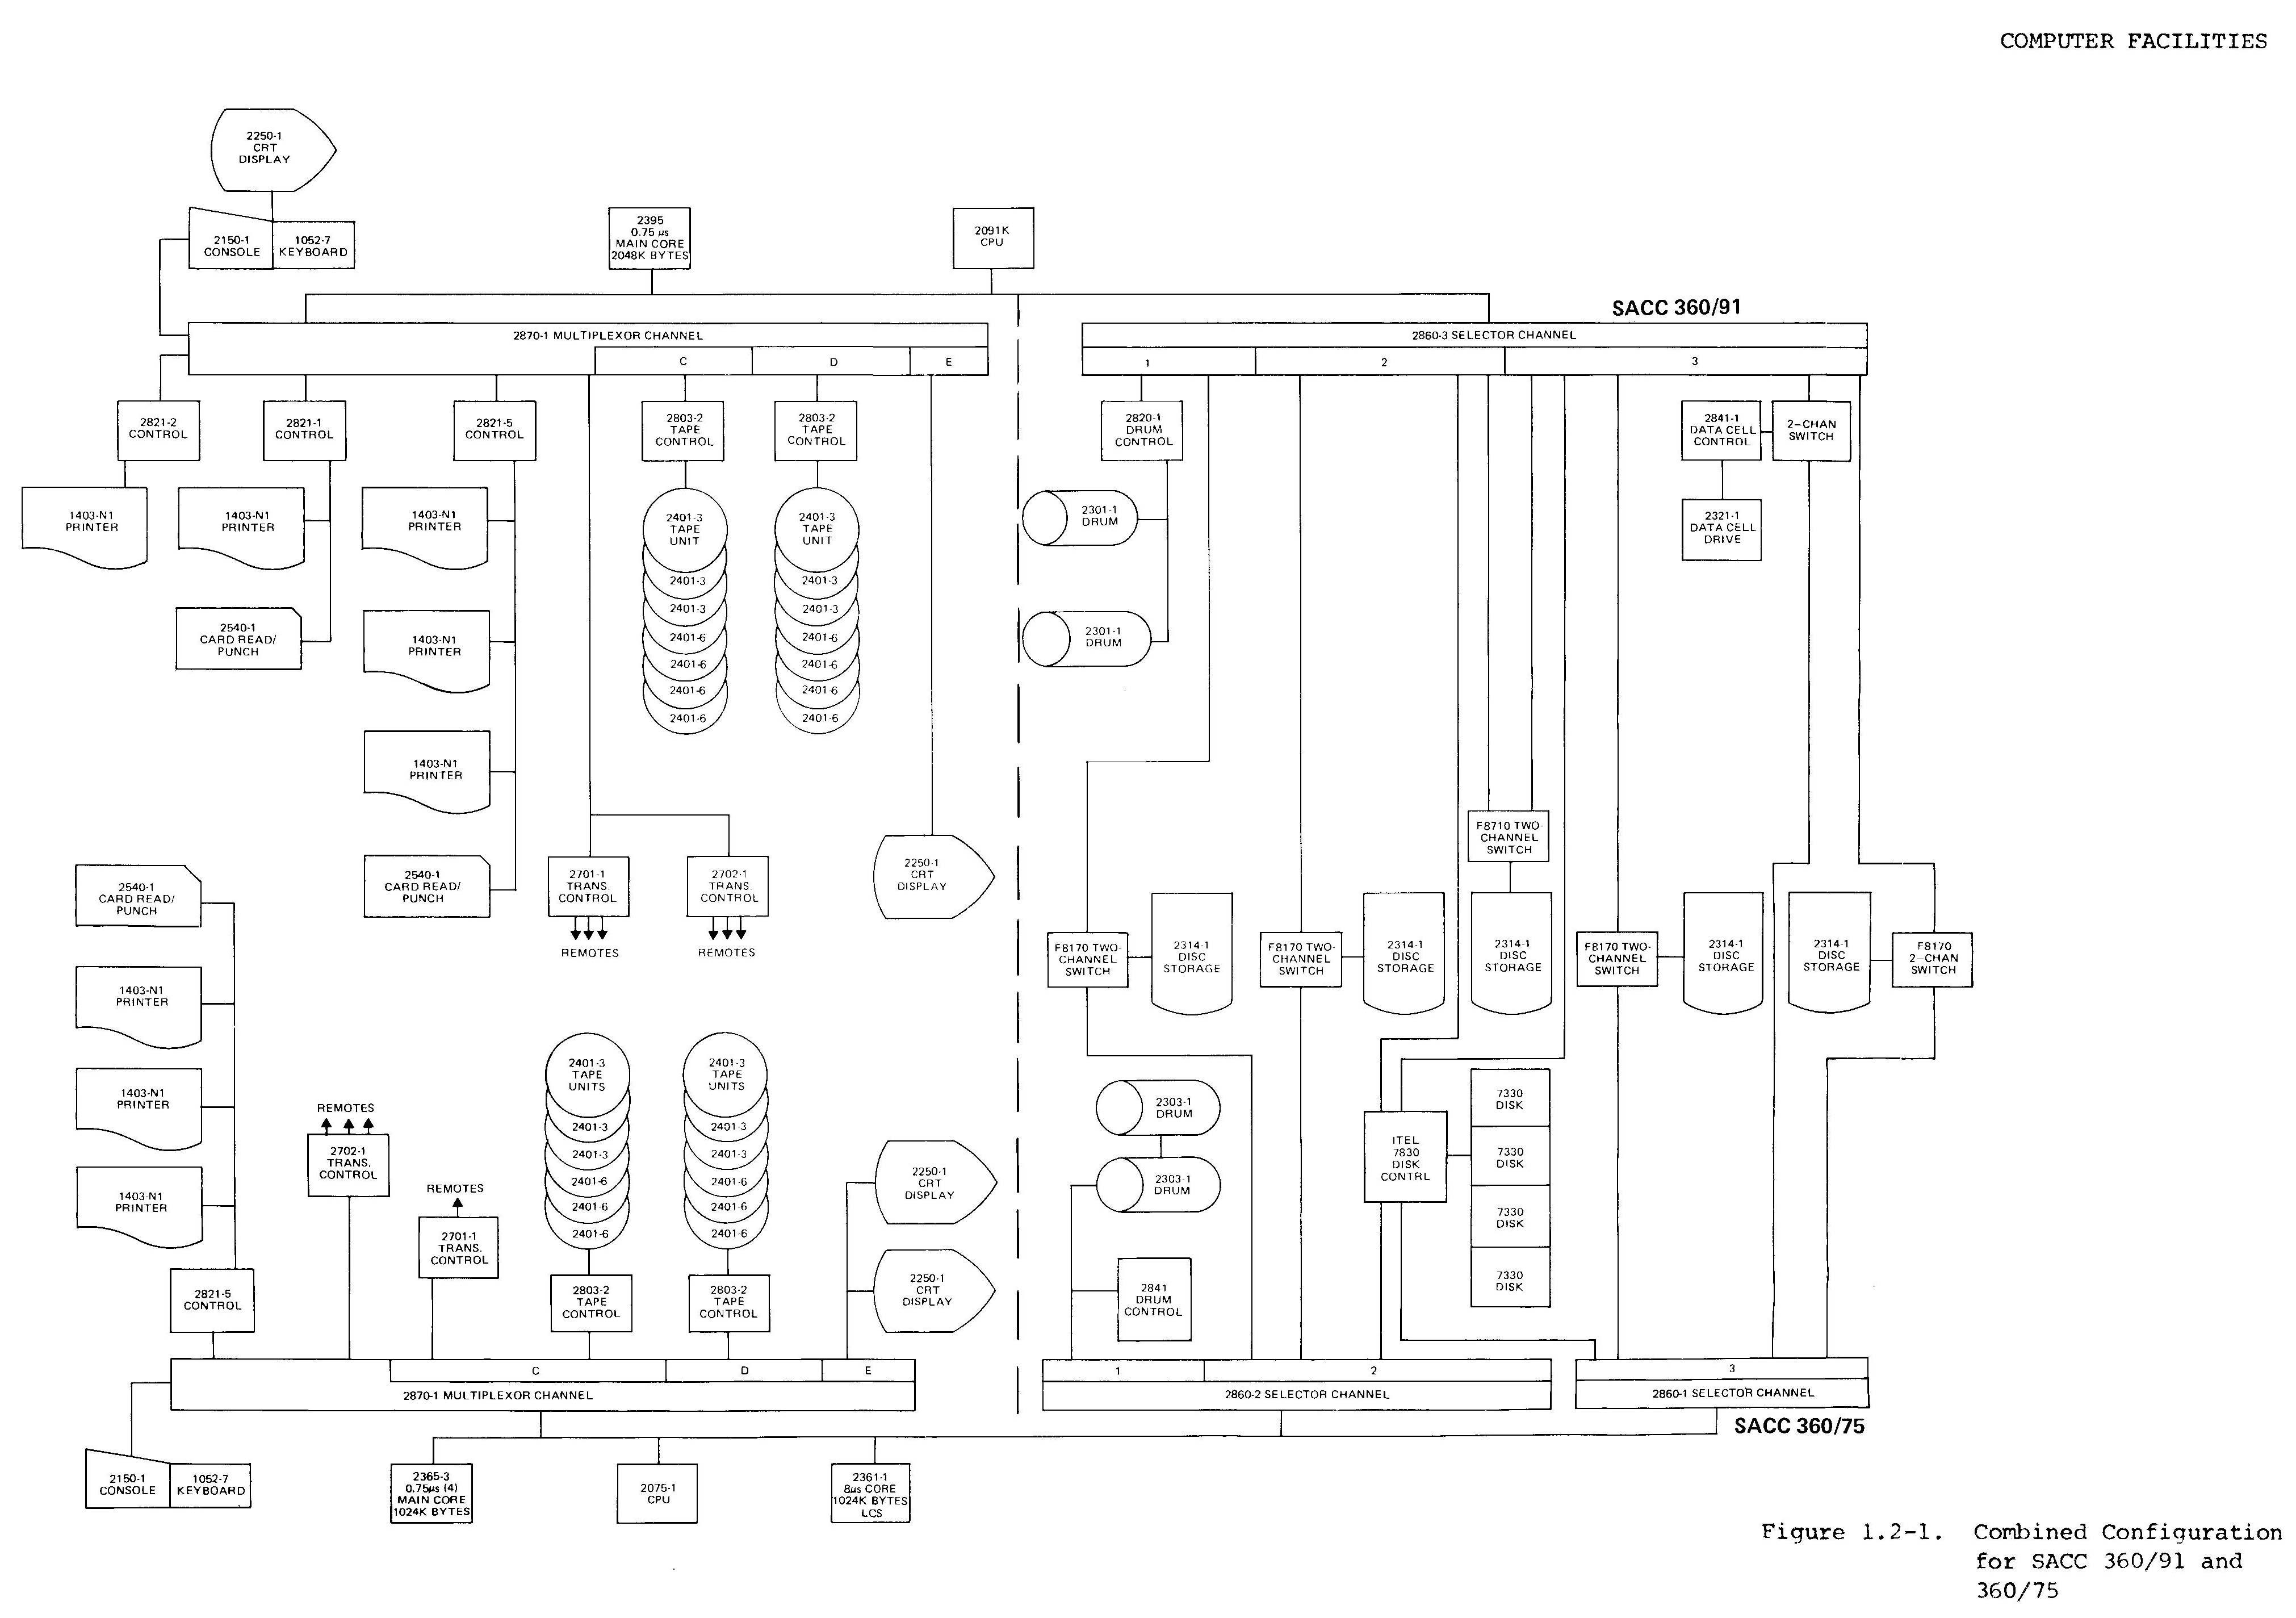 The IBM 360/91